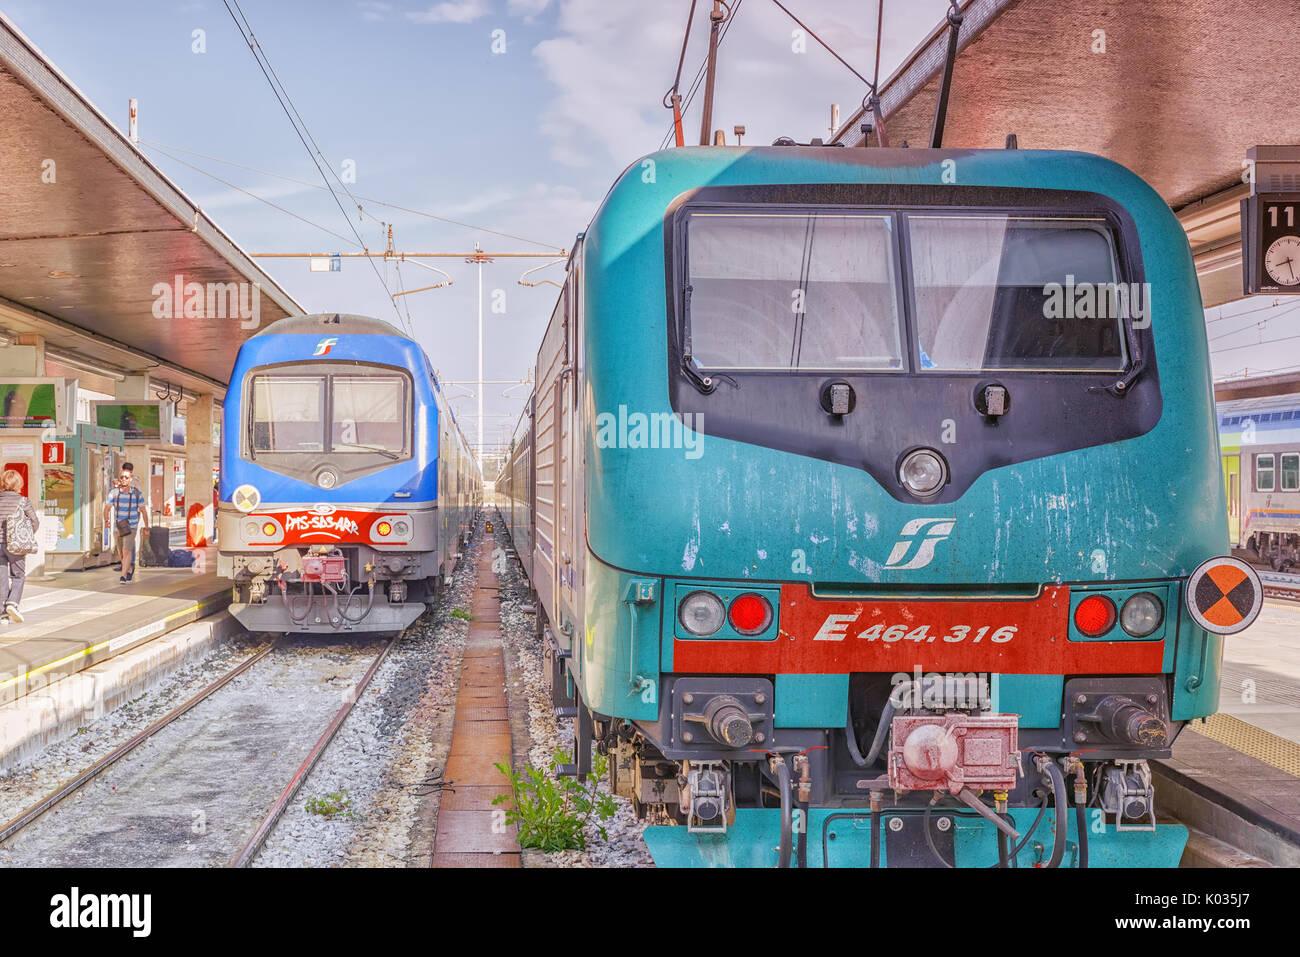 j k railway stations in venice - photo#50